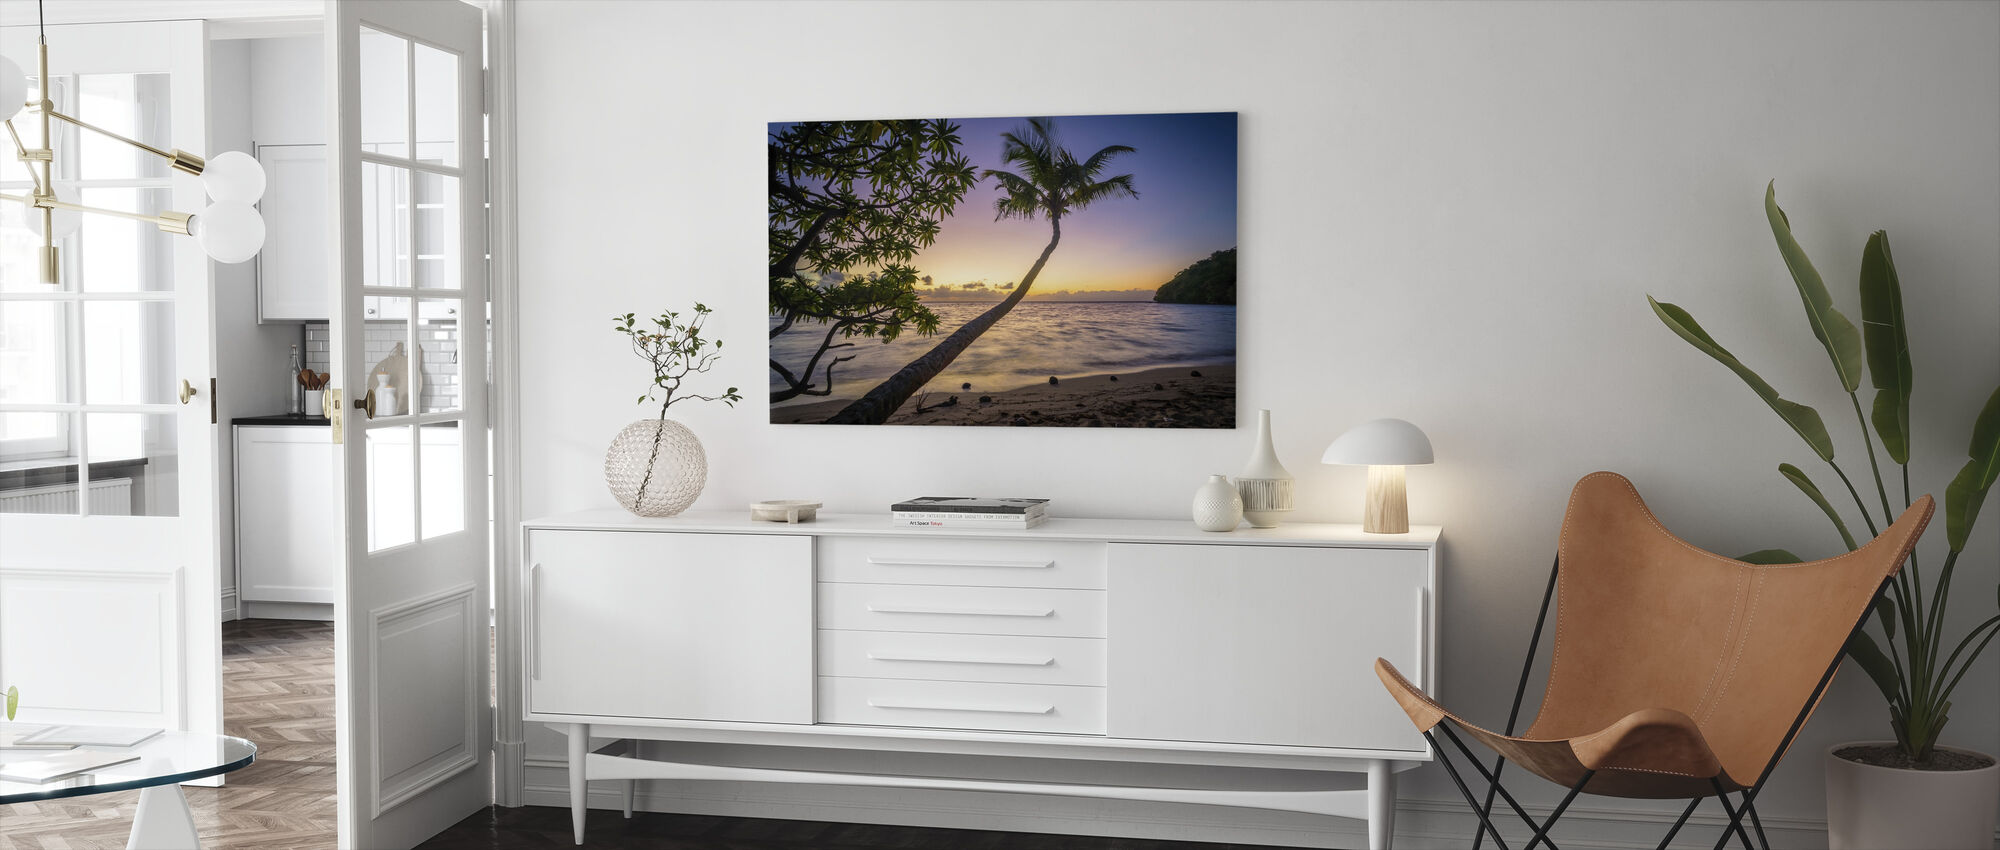 Sunset Beach - Canvas print - Living Room